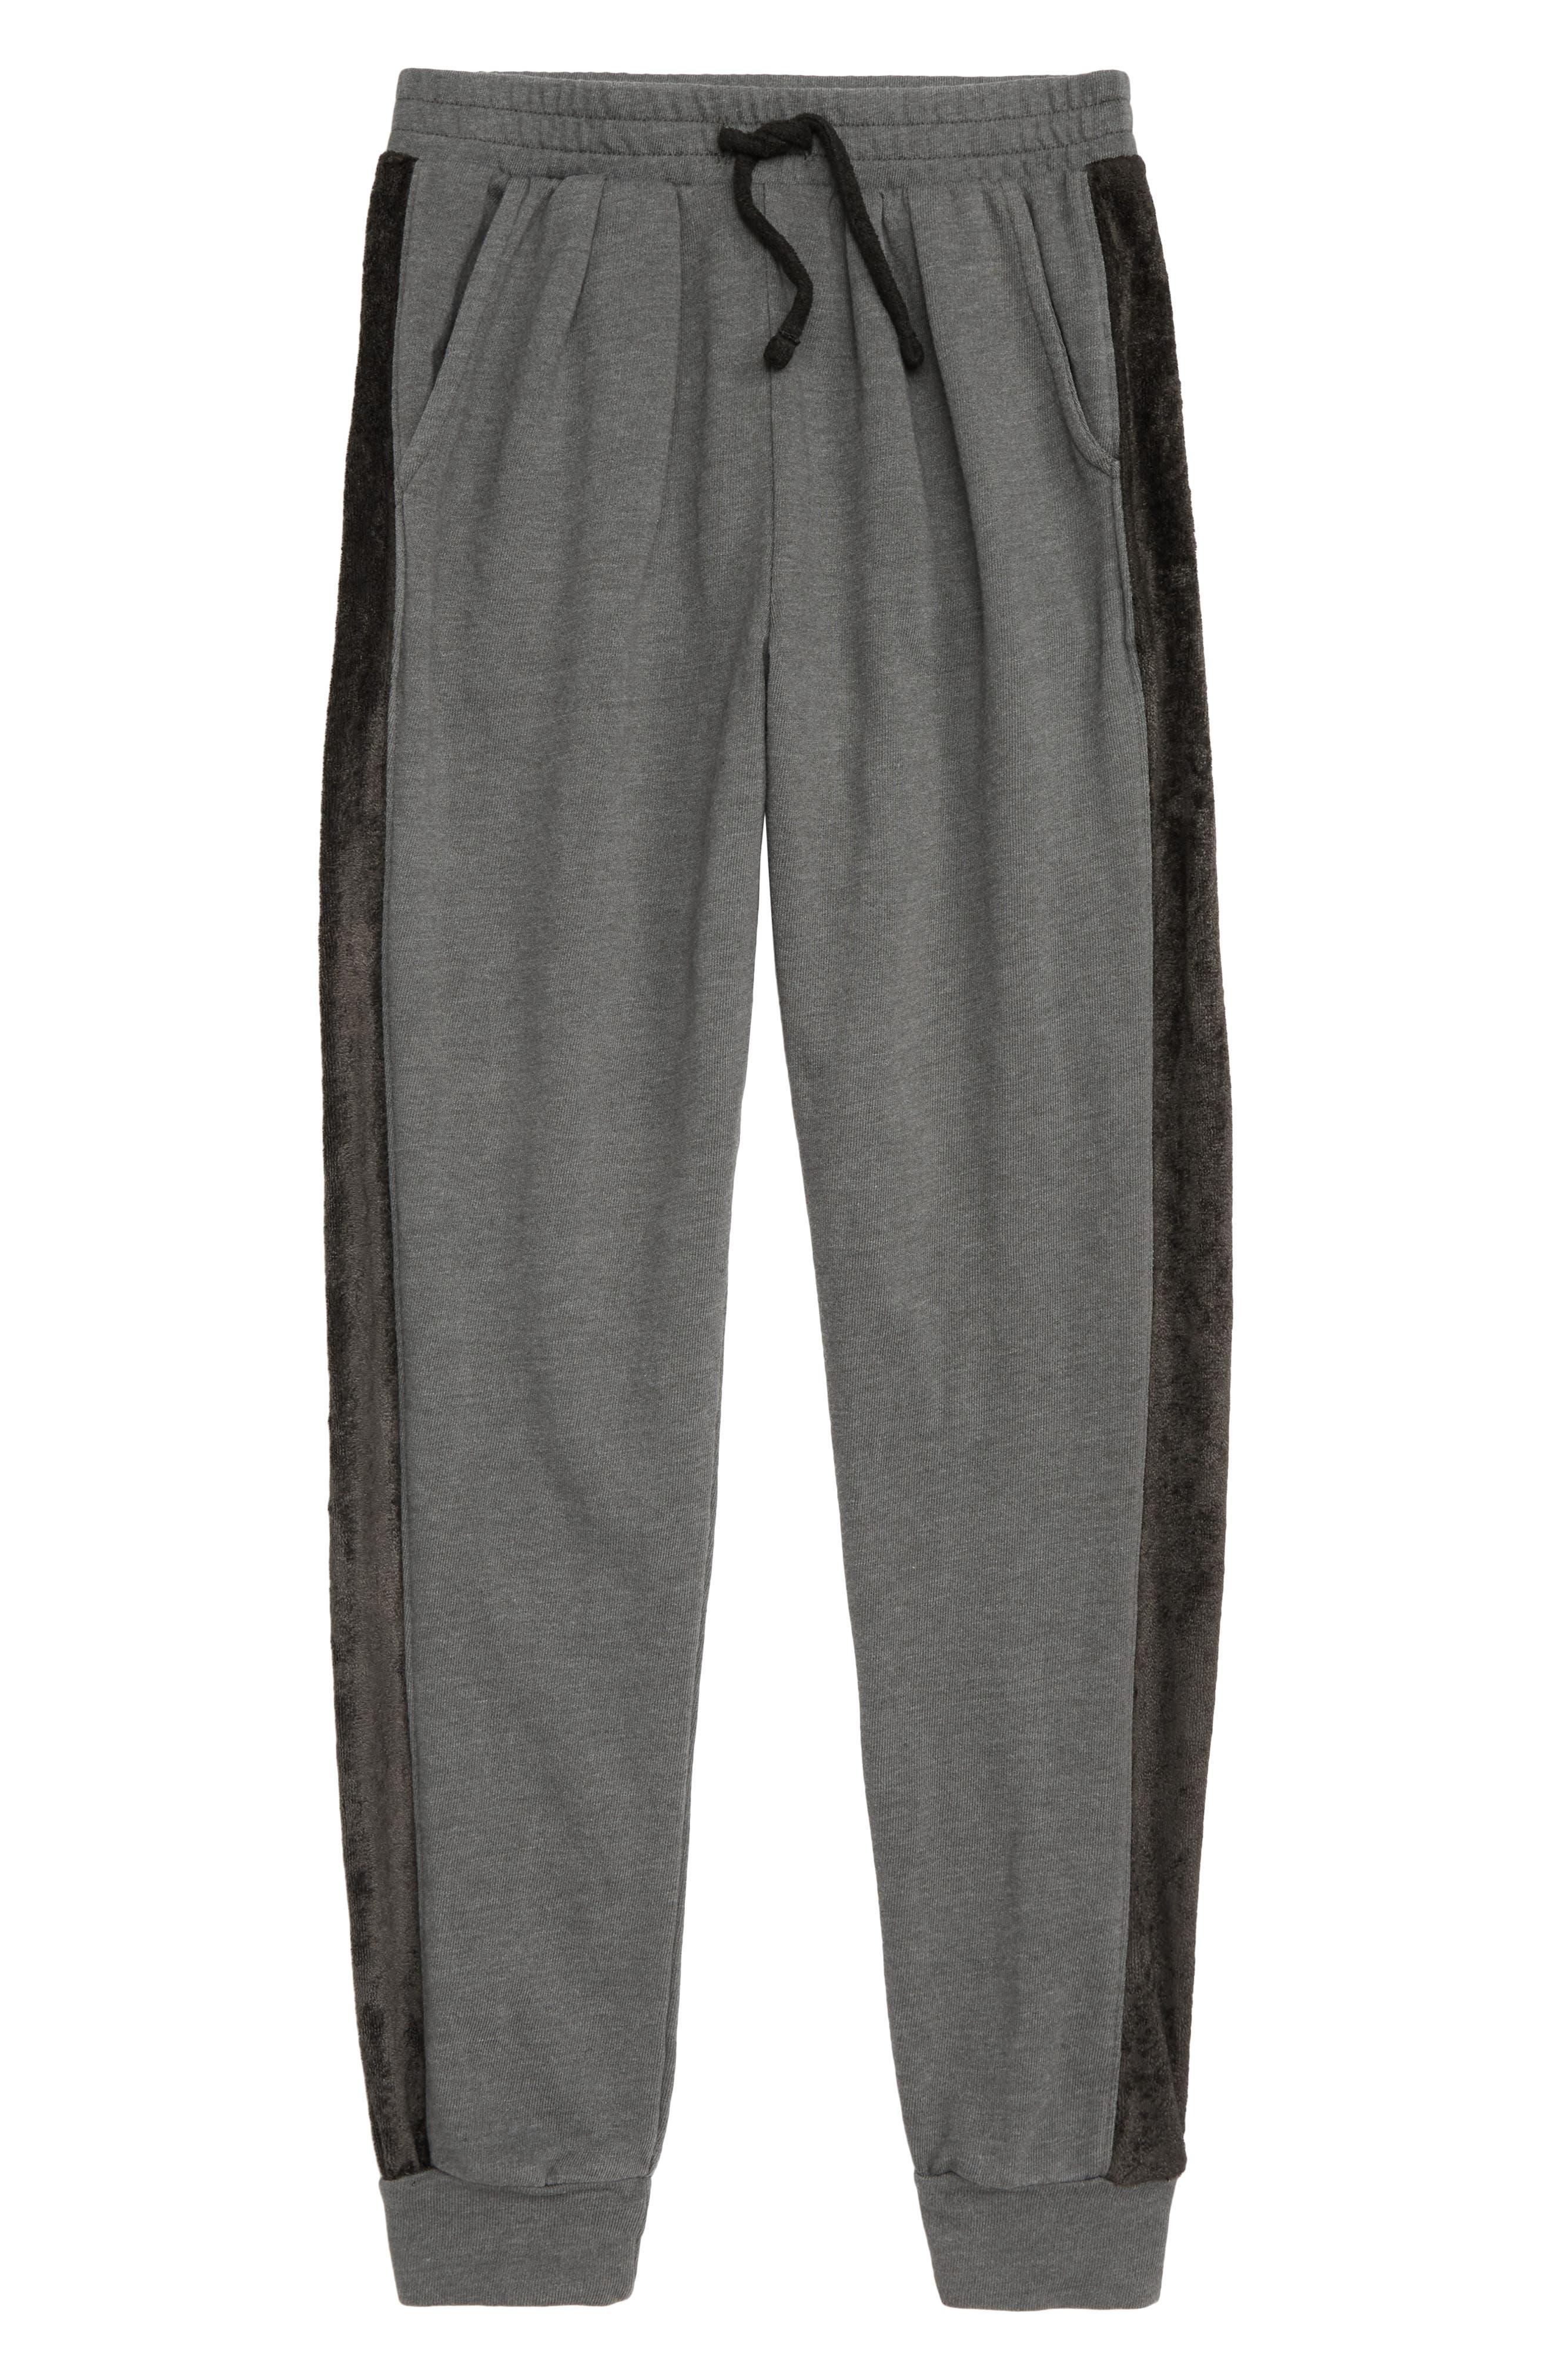 Velour Stripe Jogger Pants,                             Main thumbnail 1, color,                             GREY COBBLE